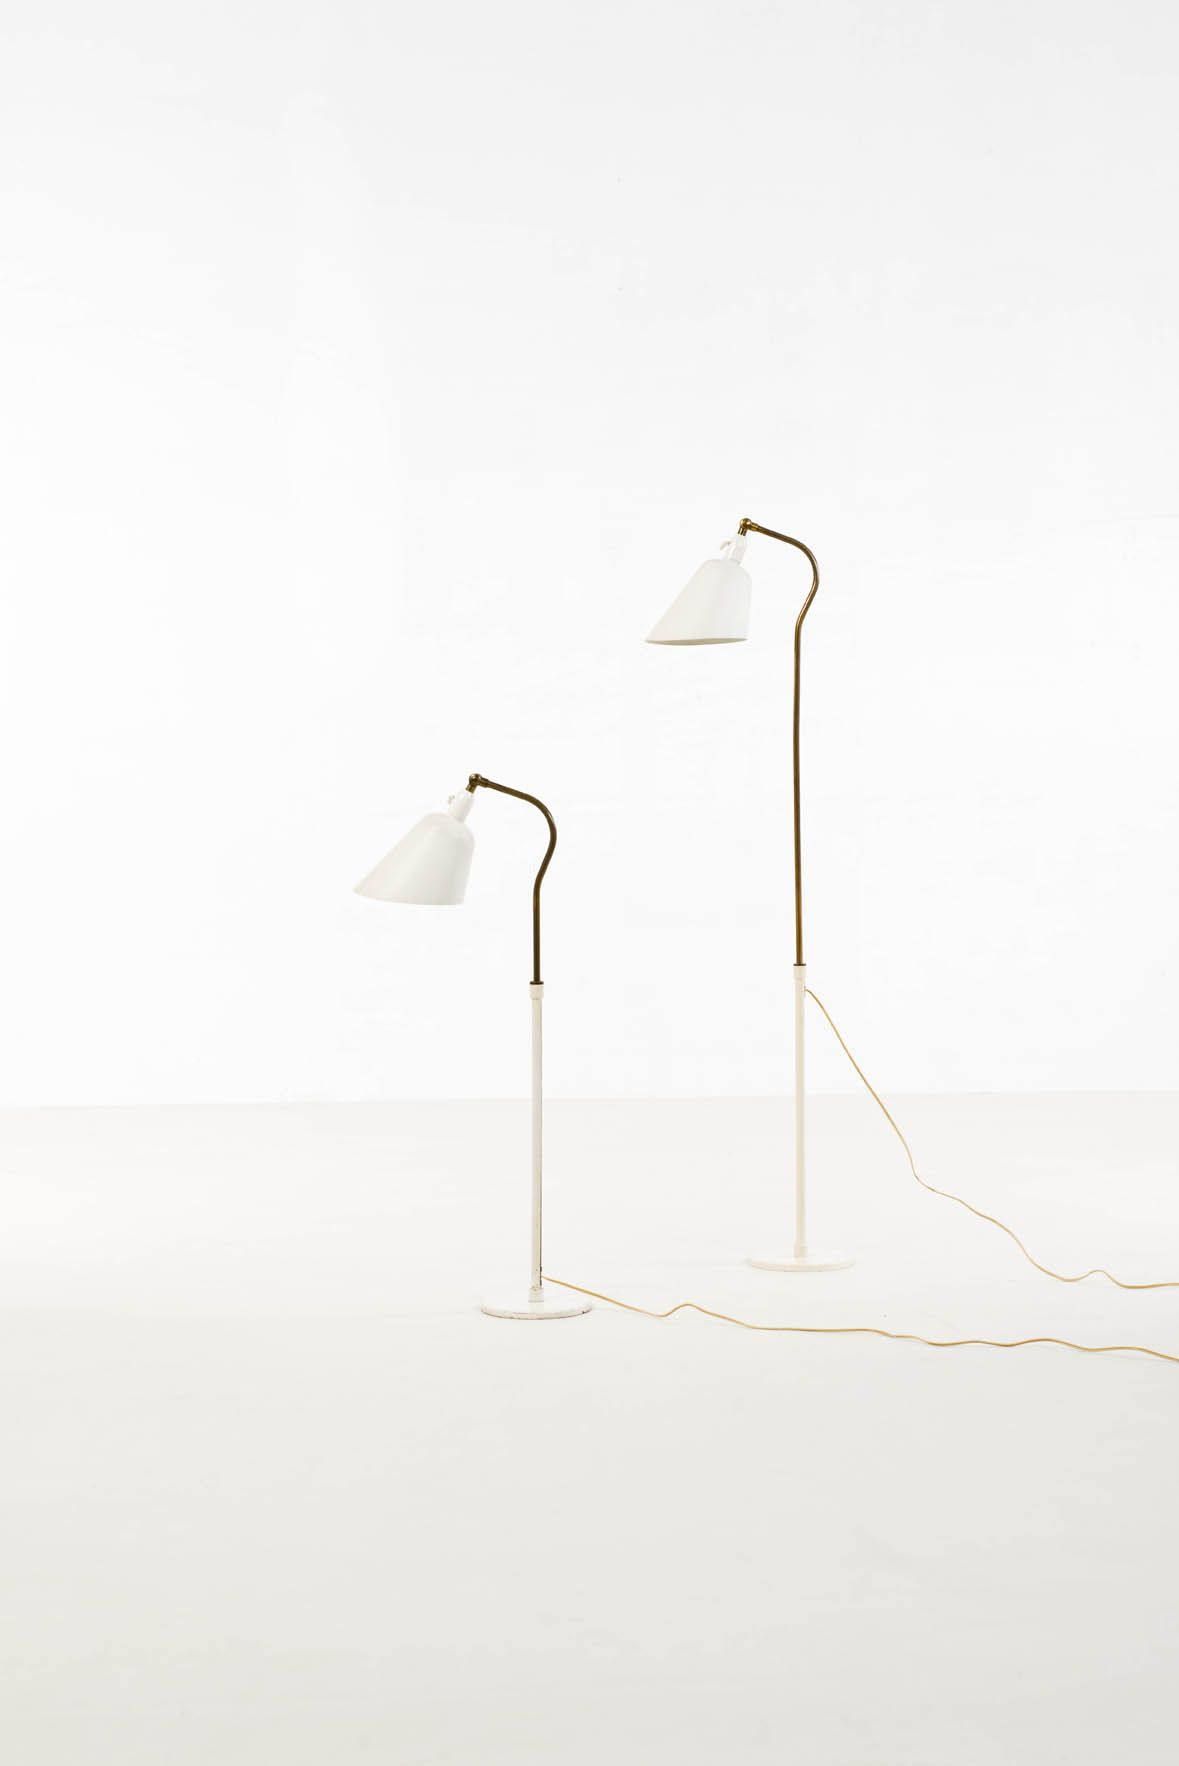 Arne Jacobsen; Brass and Enameled Metal Floor Lamps by Louis ...